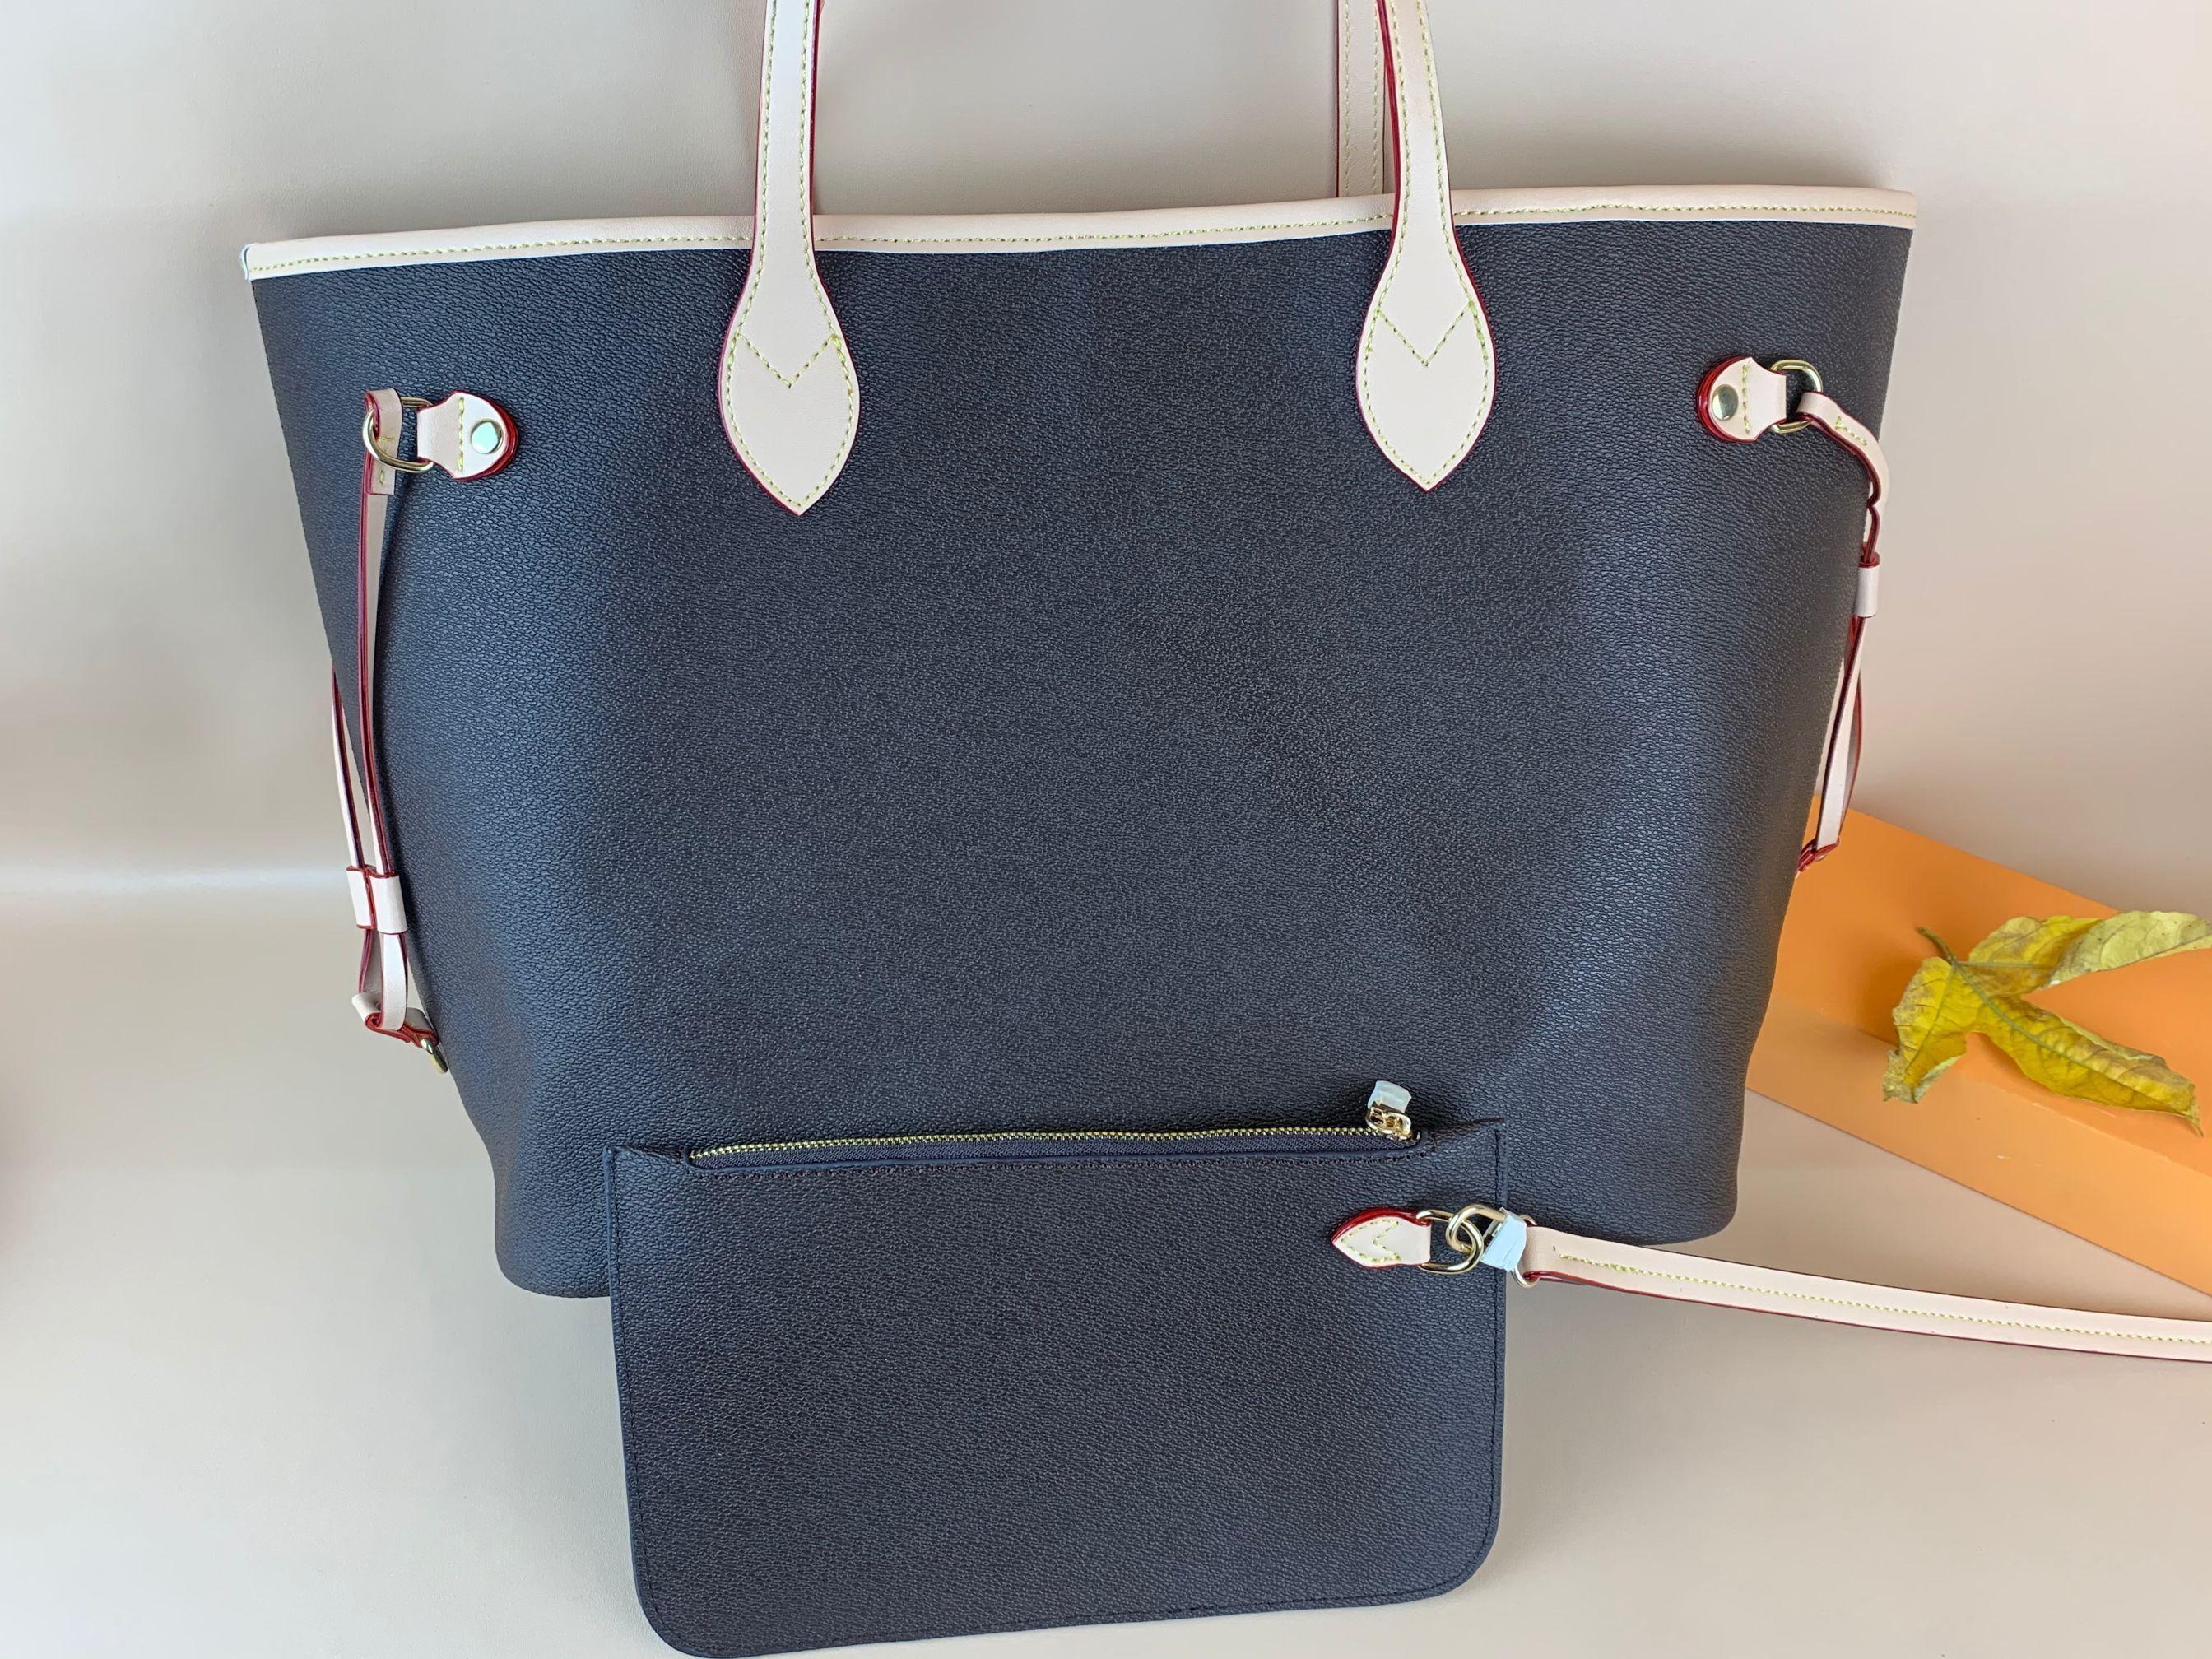 ClassWholesale السعر بيع عالية الجودة أزياء المرأة حقائب جلدية مع محفظة السيدات اليد مع الحقيبة حقائب الكتف التسوق 2 قطعة مجموعة